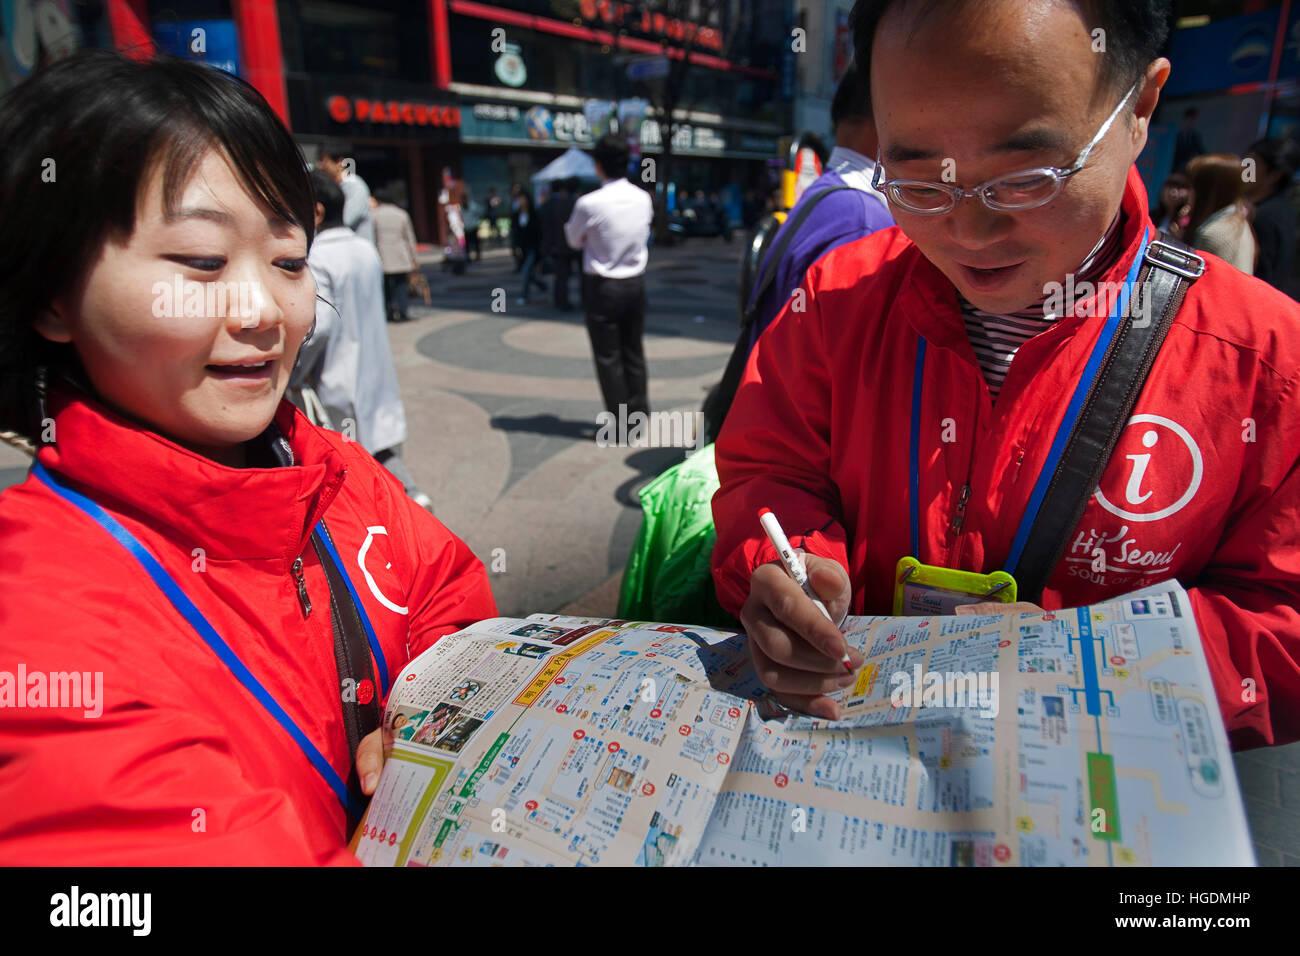 Tourist information officers Seoul South Korea Stock Photo - Alamy